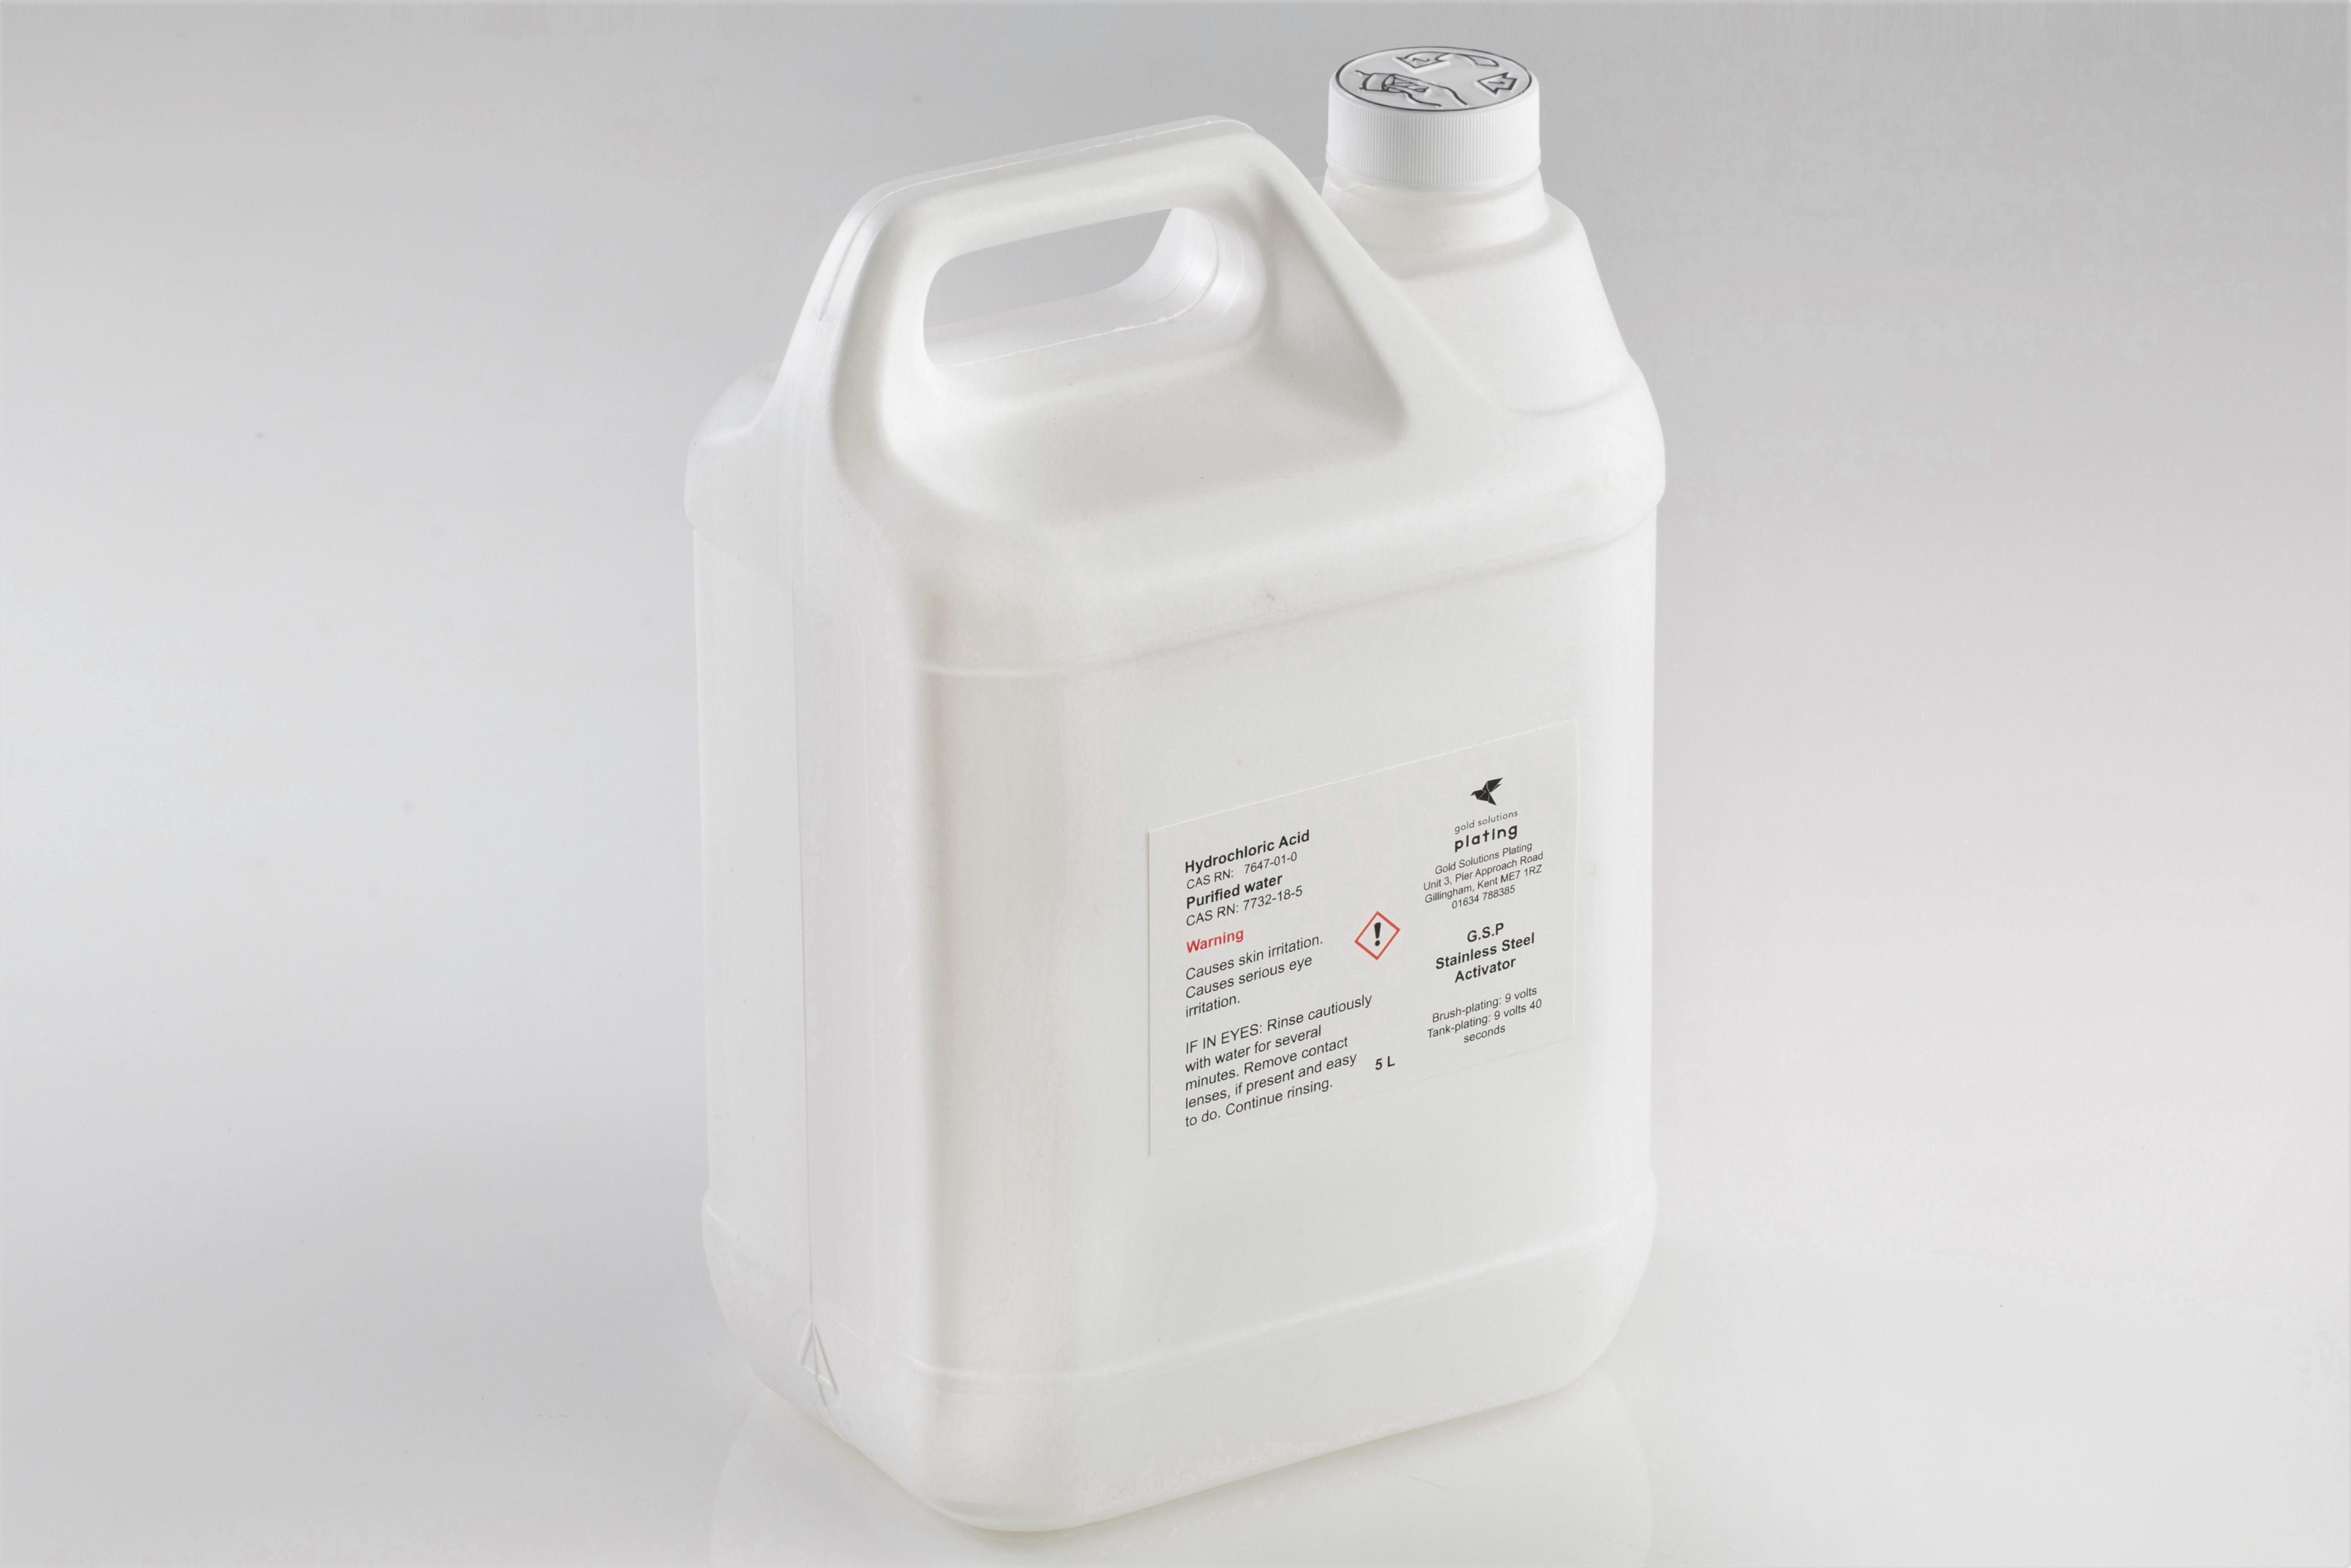 G.S.P Stainless Steel Activator, 5 litre bottle